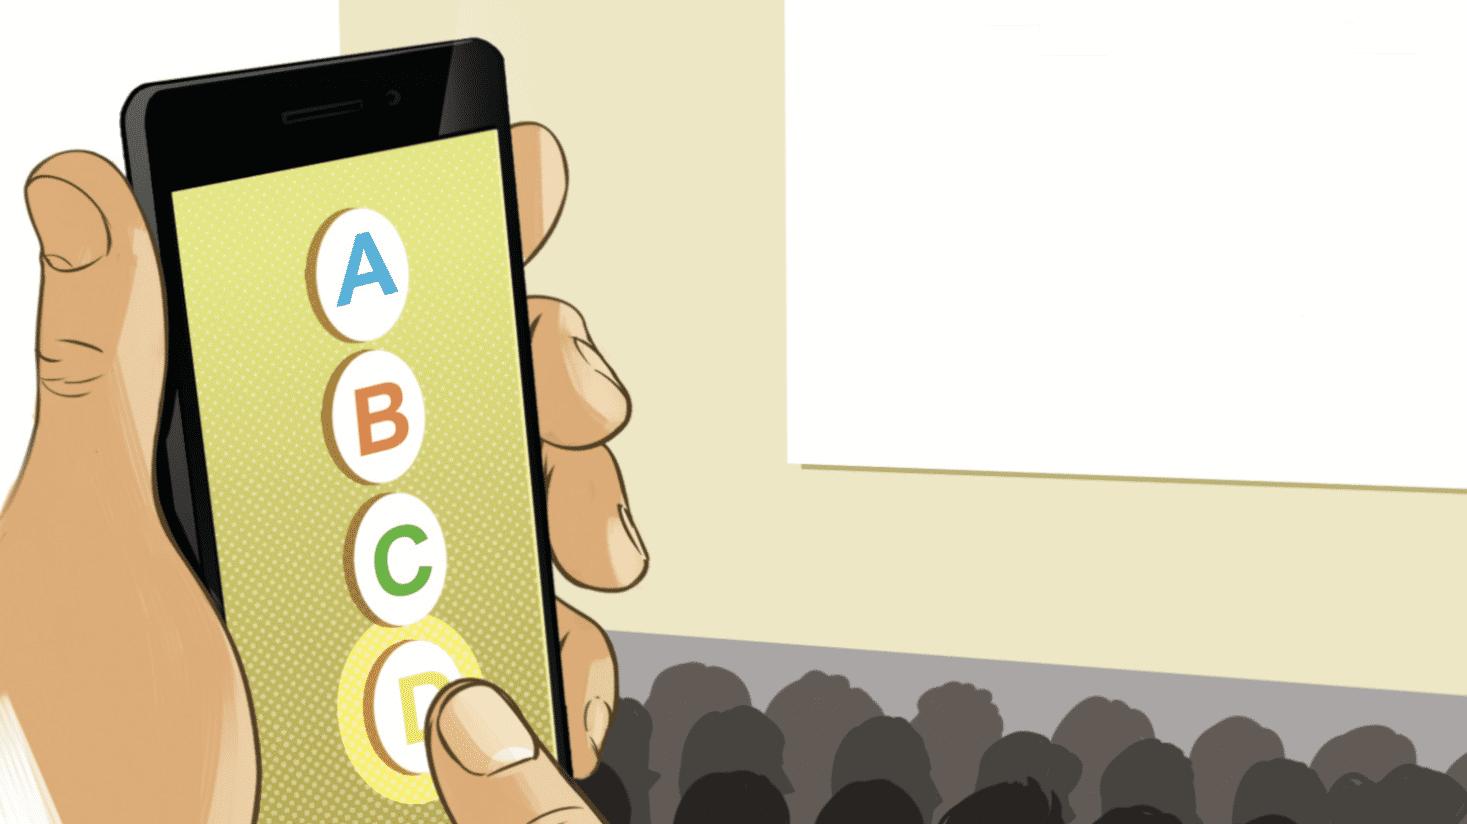 Mobil abstimmen: Live-Voting-Systeme im Test